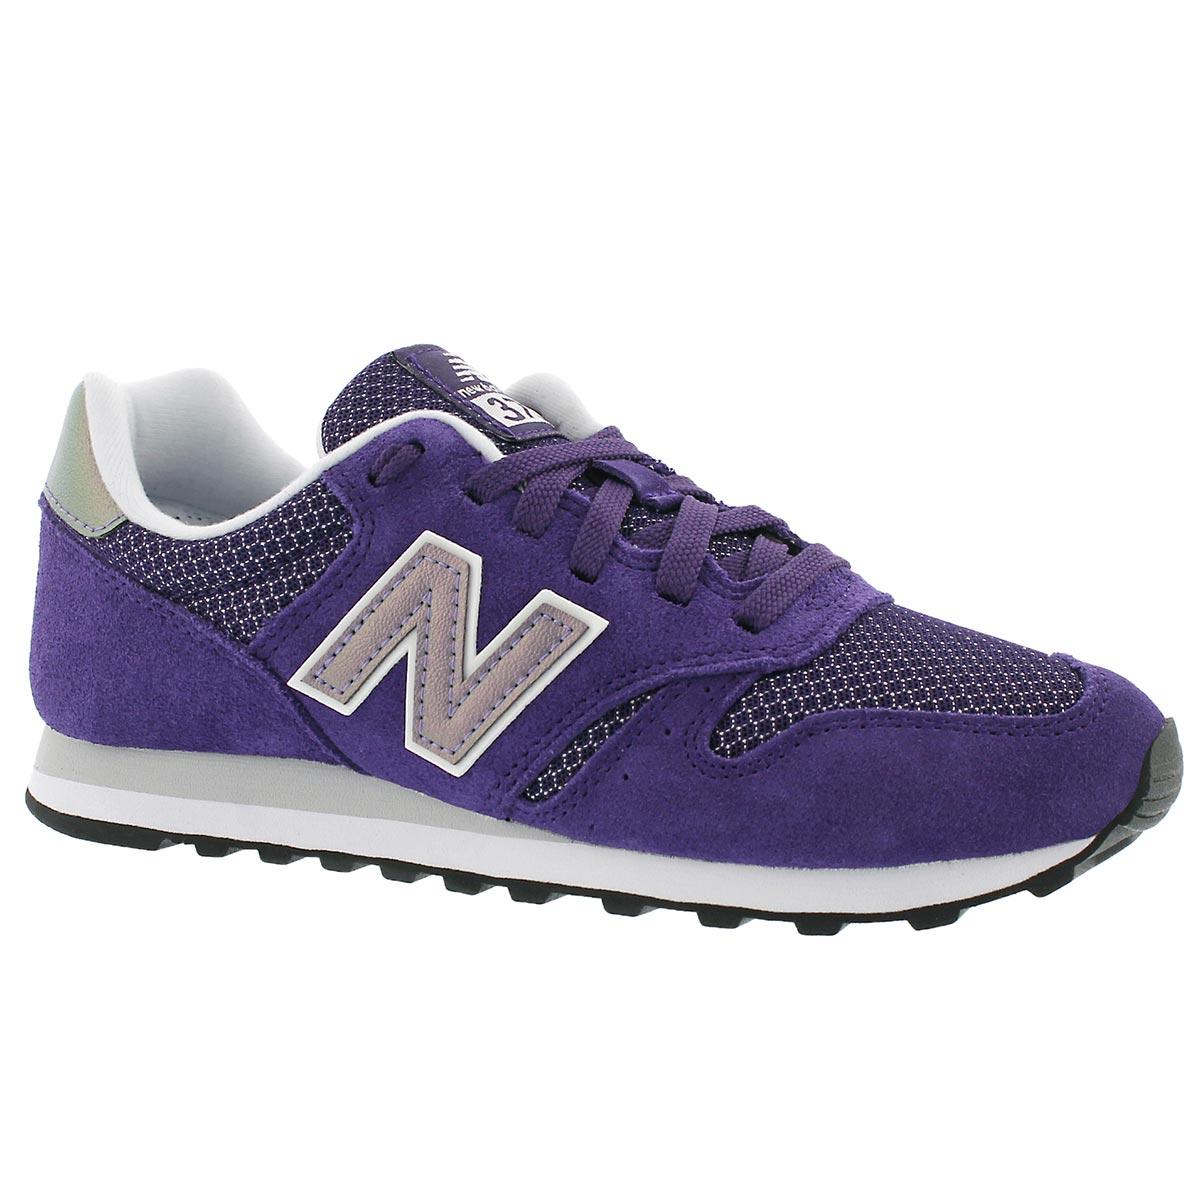 Women's 373 purple lace up running shoe